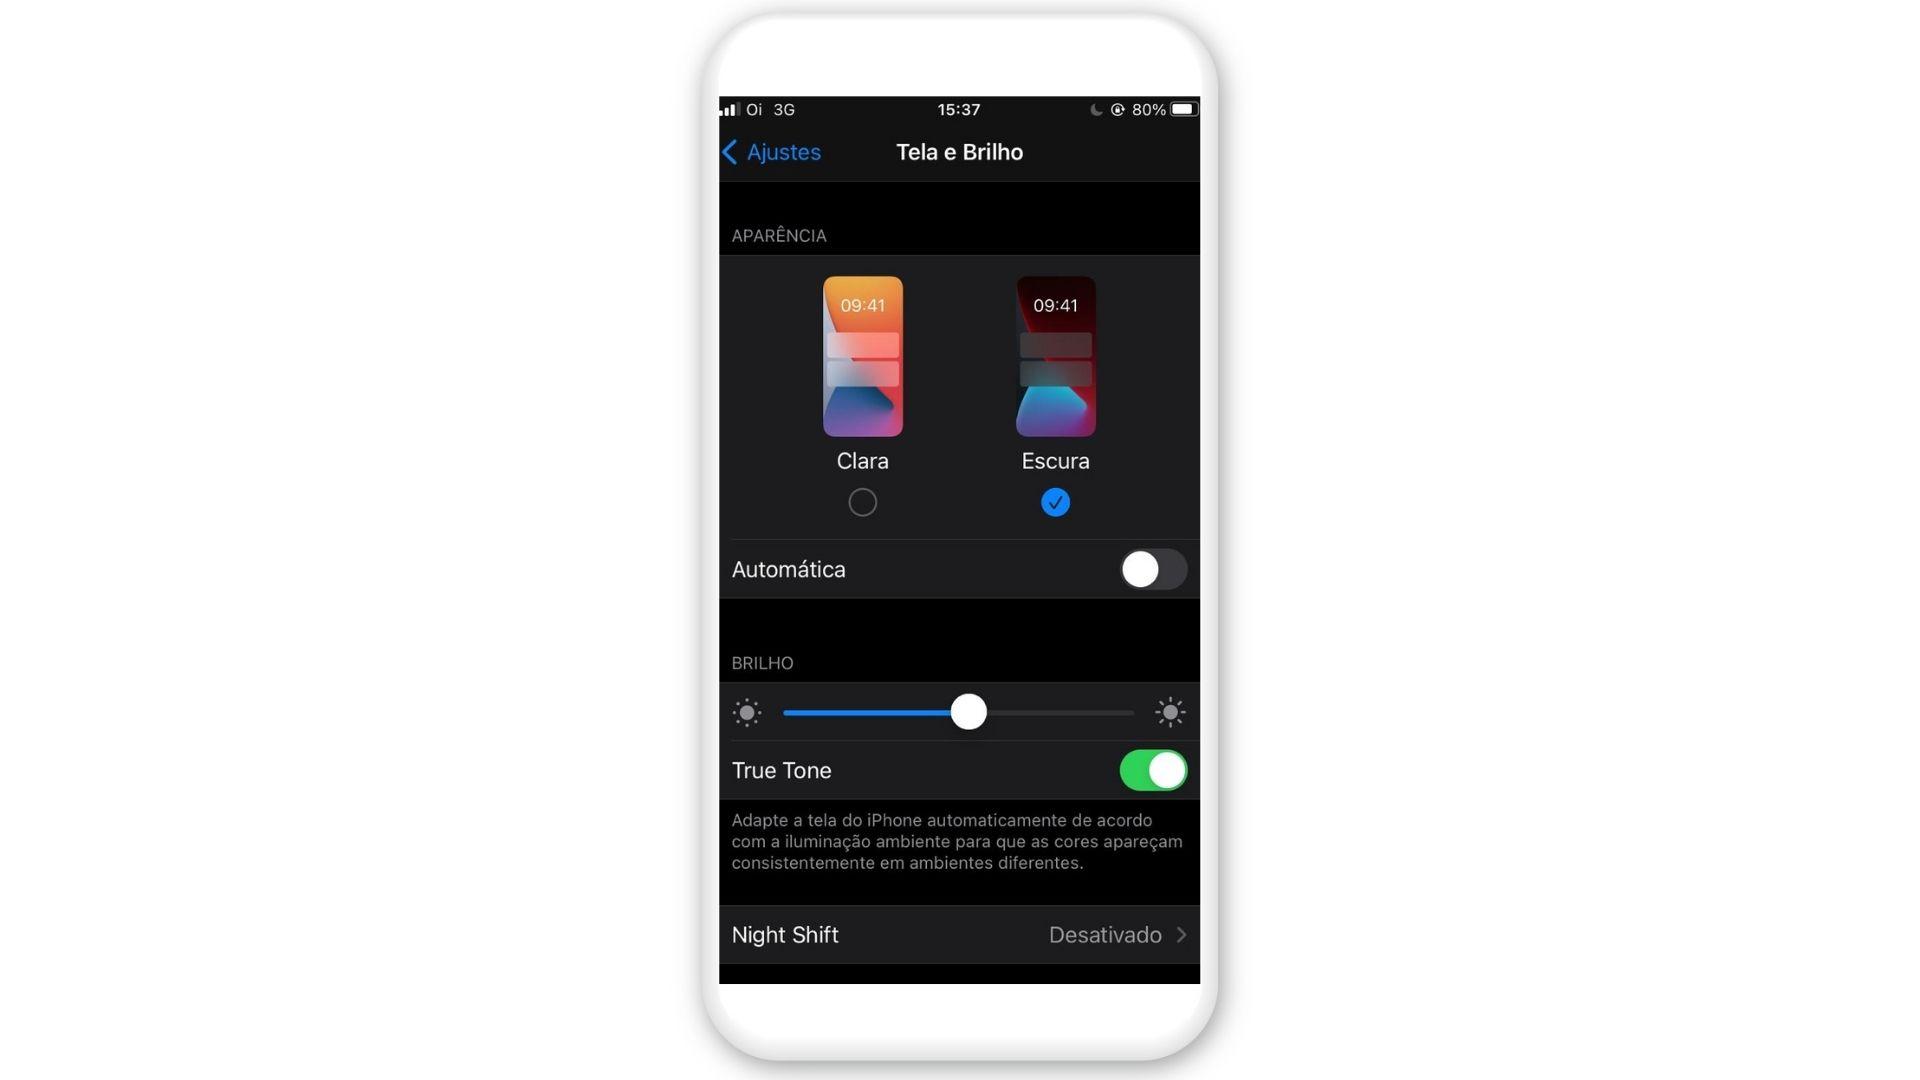 Print de tela mostrando como colocar o Google no modo escuro no iPhone